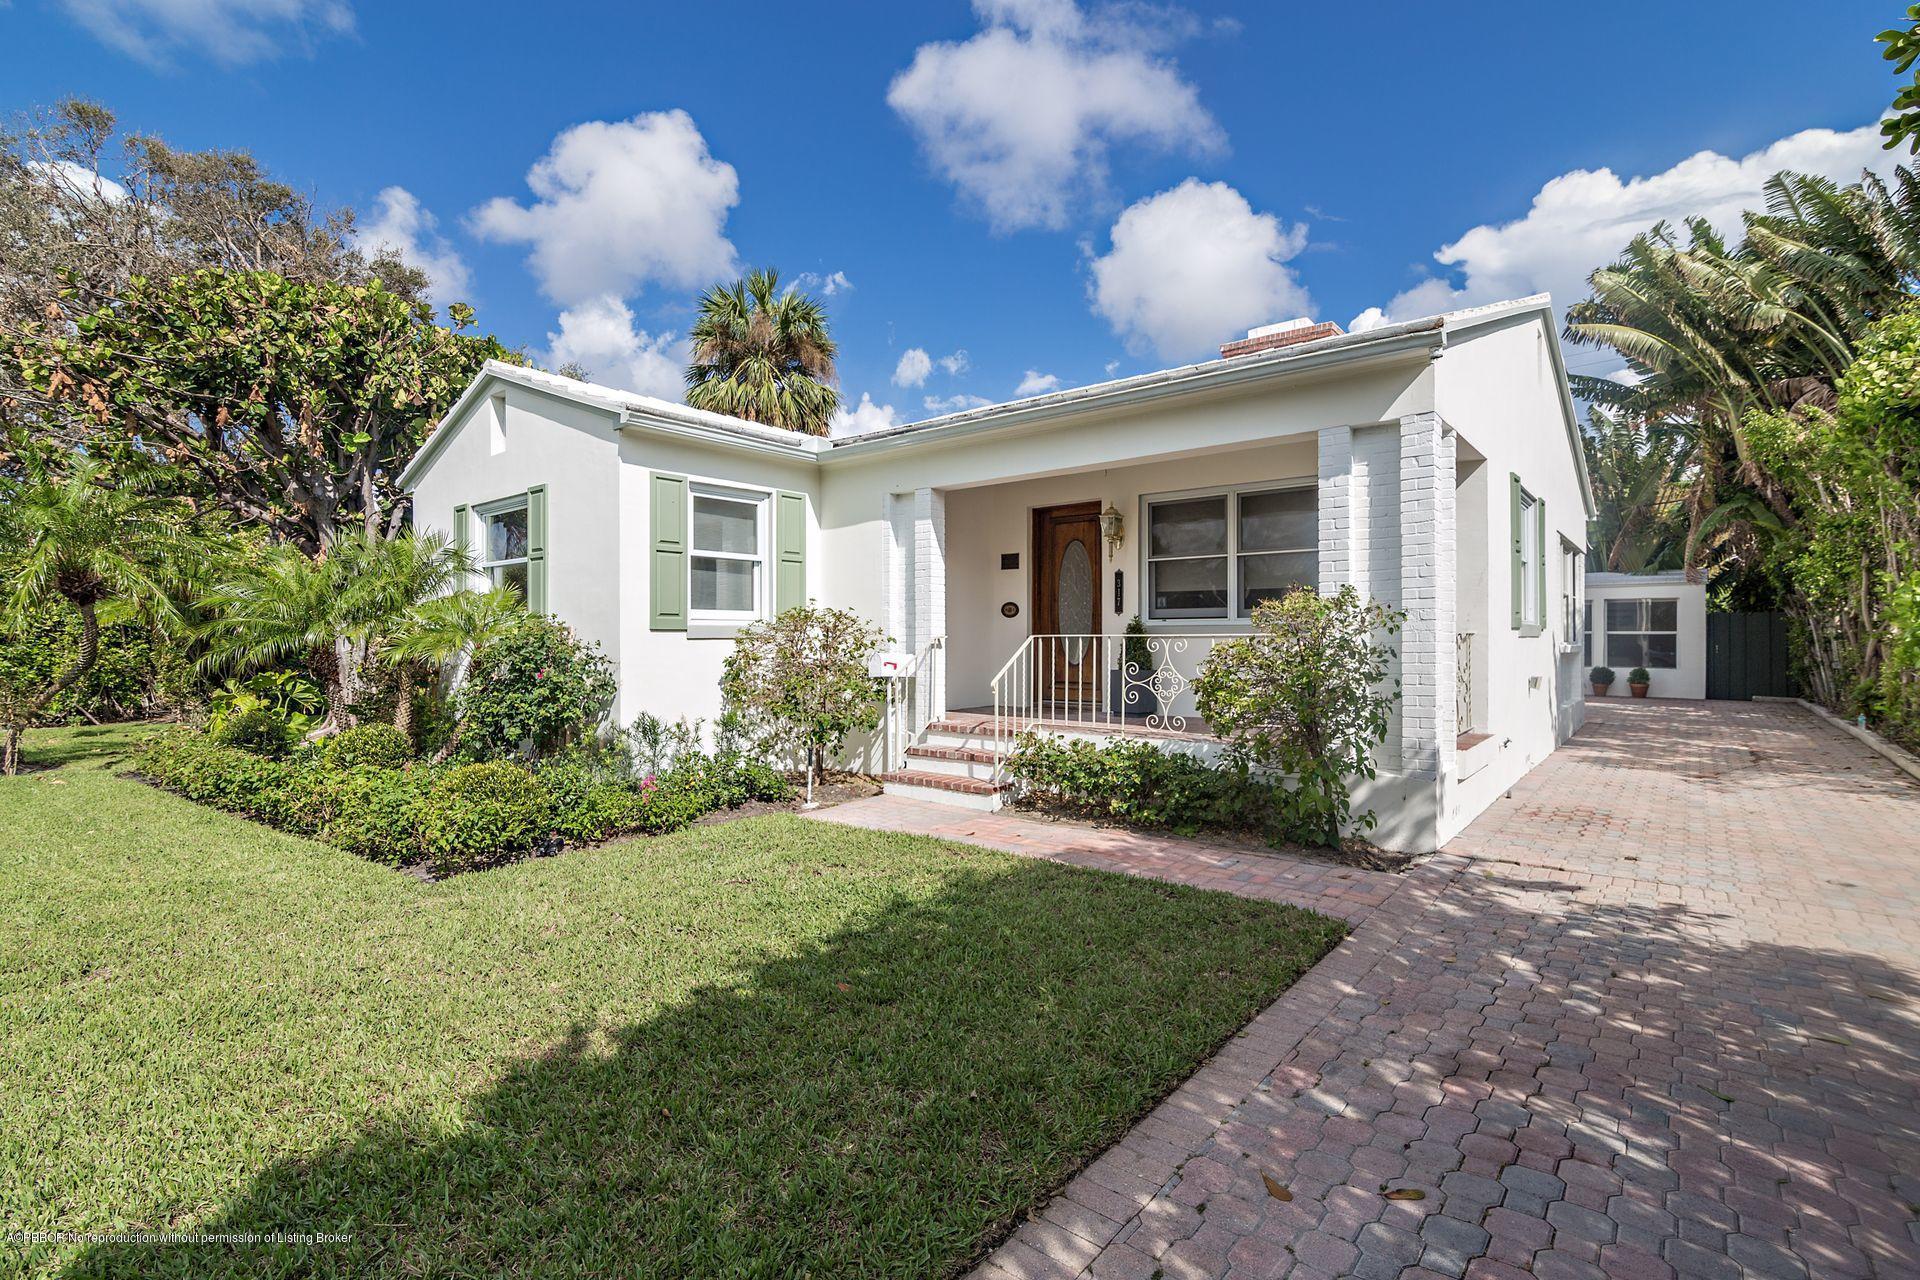 317 Granada Road - West Palm Beach, Florida